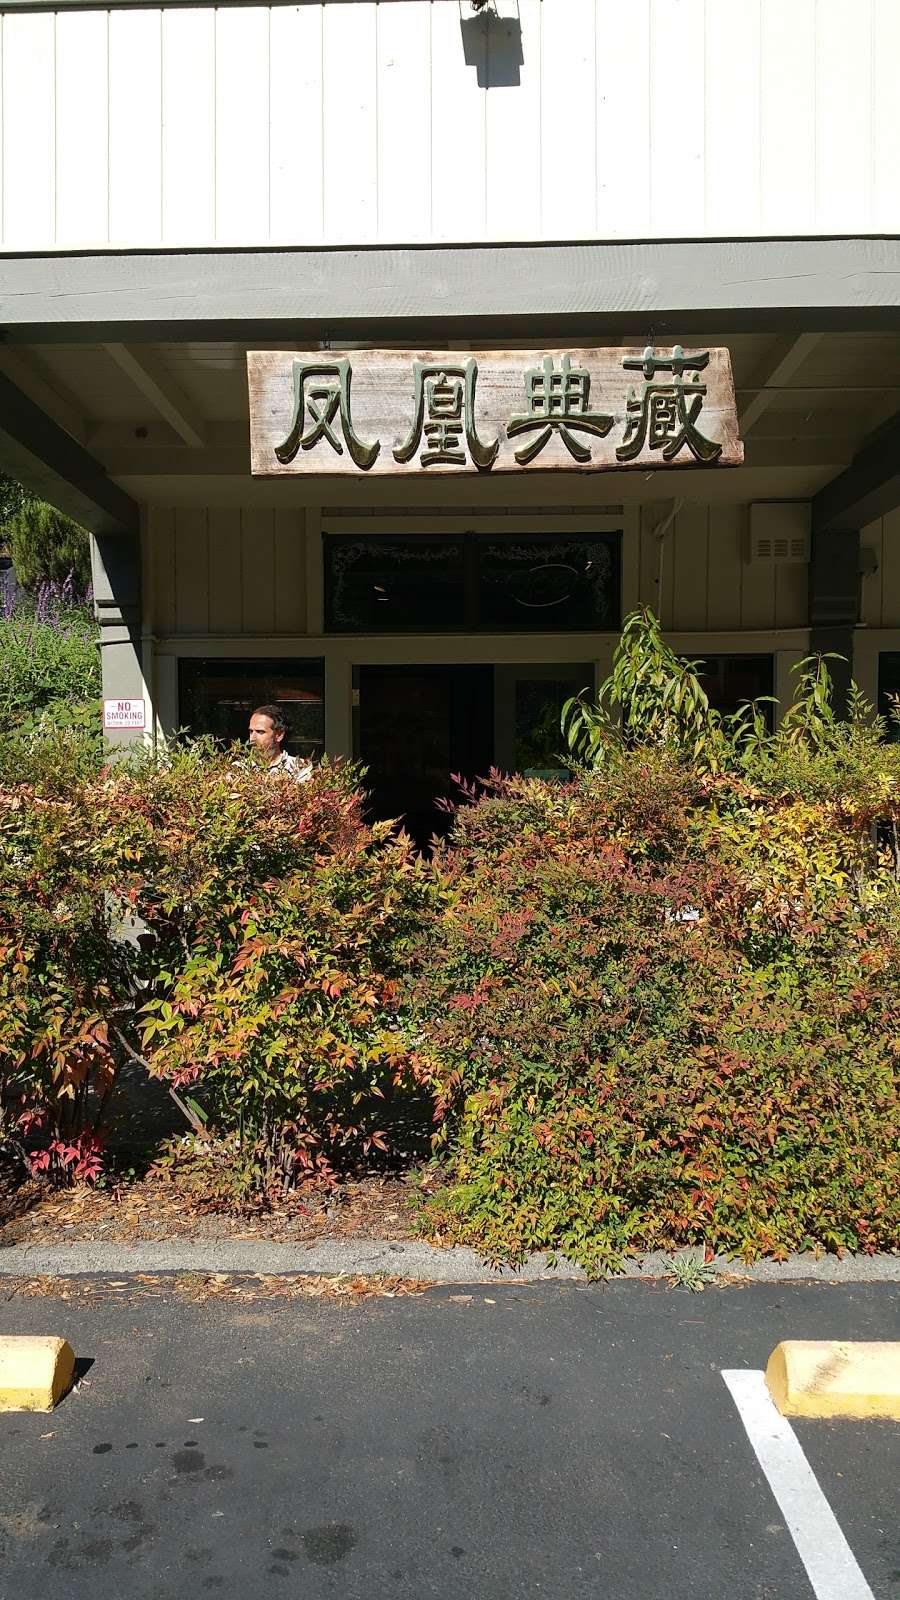 Tea Museum & The Phoenix Collection - museum  | Photo 8 of 10 | Address: 7282 Sir Francis Drake Blvd, Lagunitas, CA 94938, USA | Phone: (415) 488-9017